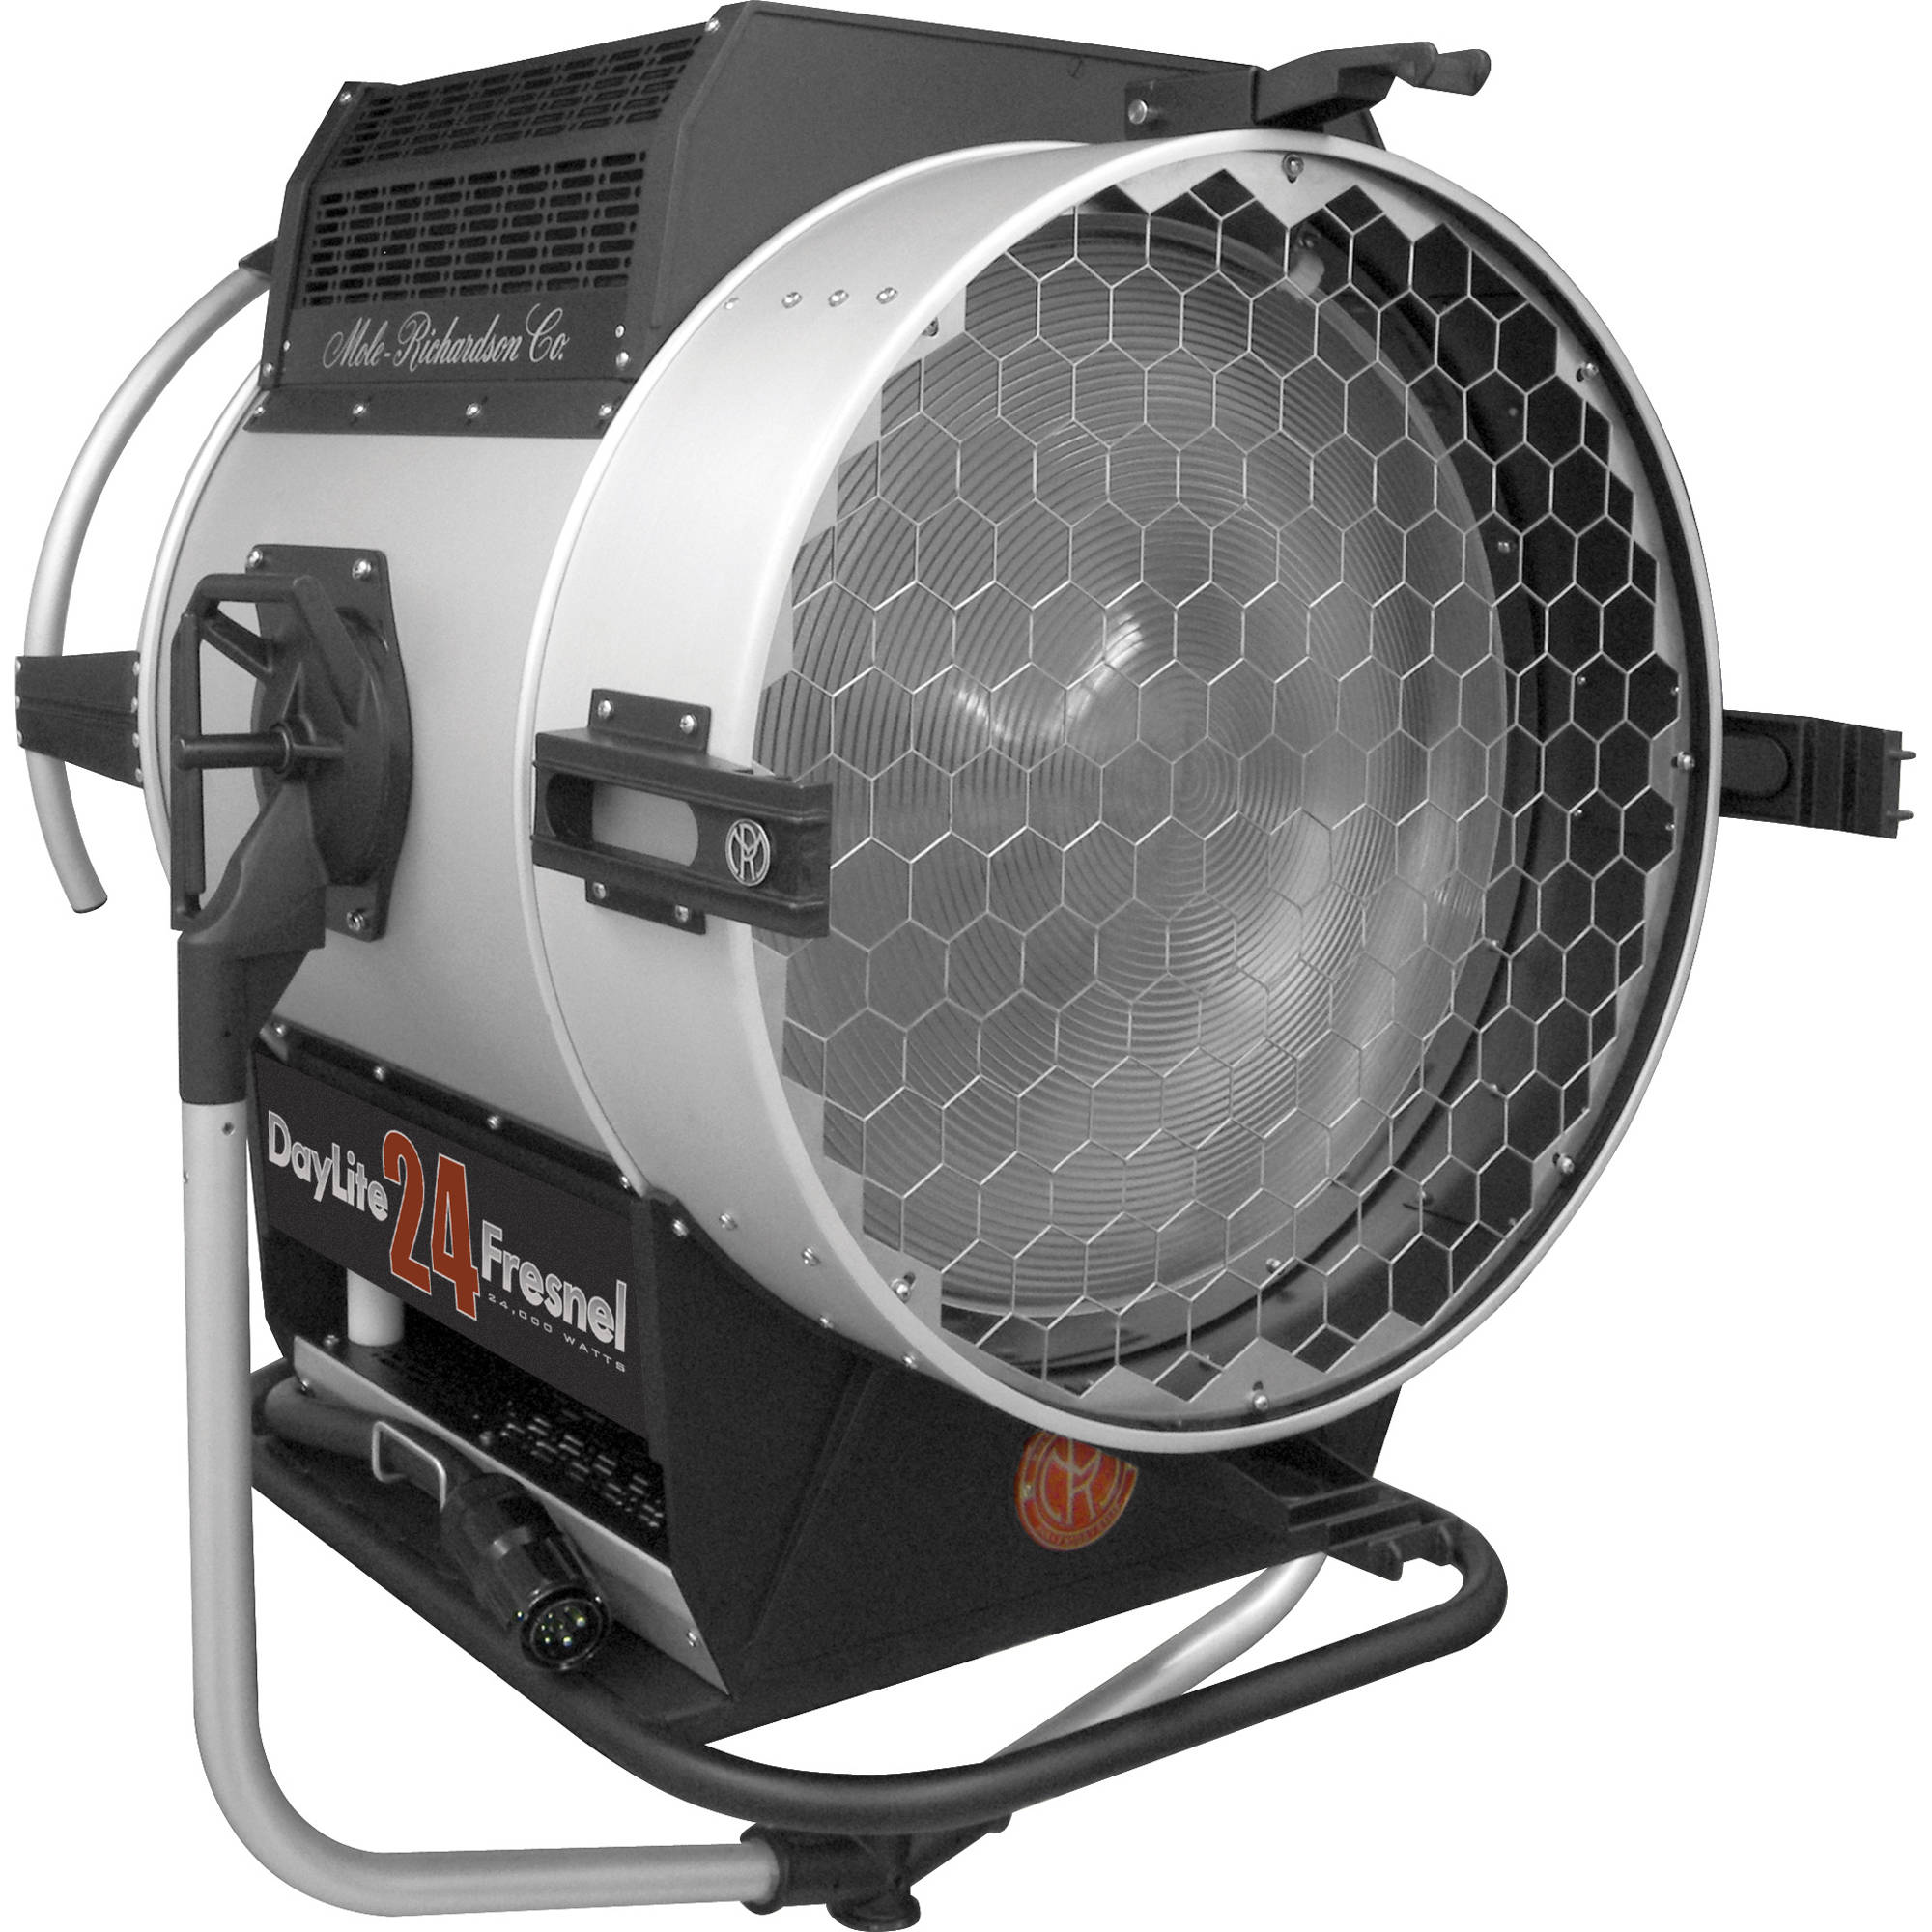 Mole Richardson Fresnel: Mole-Richardson Daylite Fresnel Fixture (24,000W) 6861 B&H